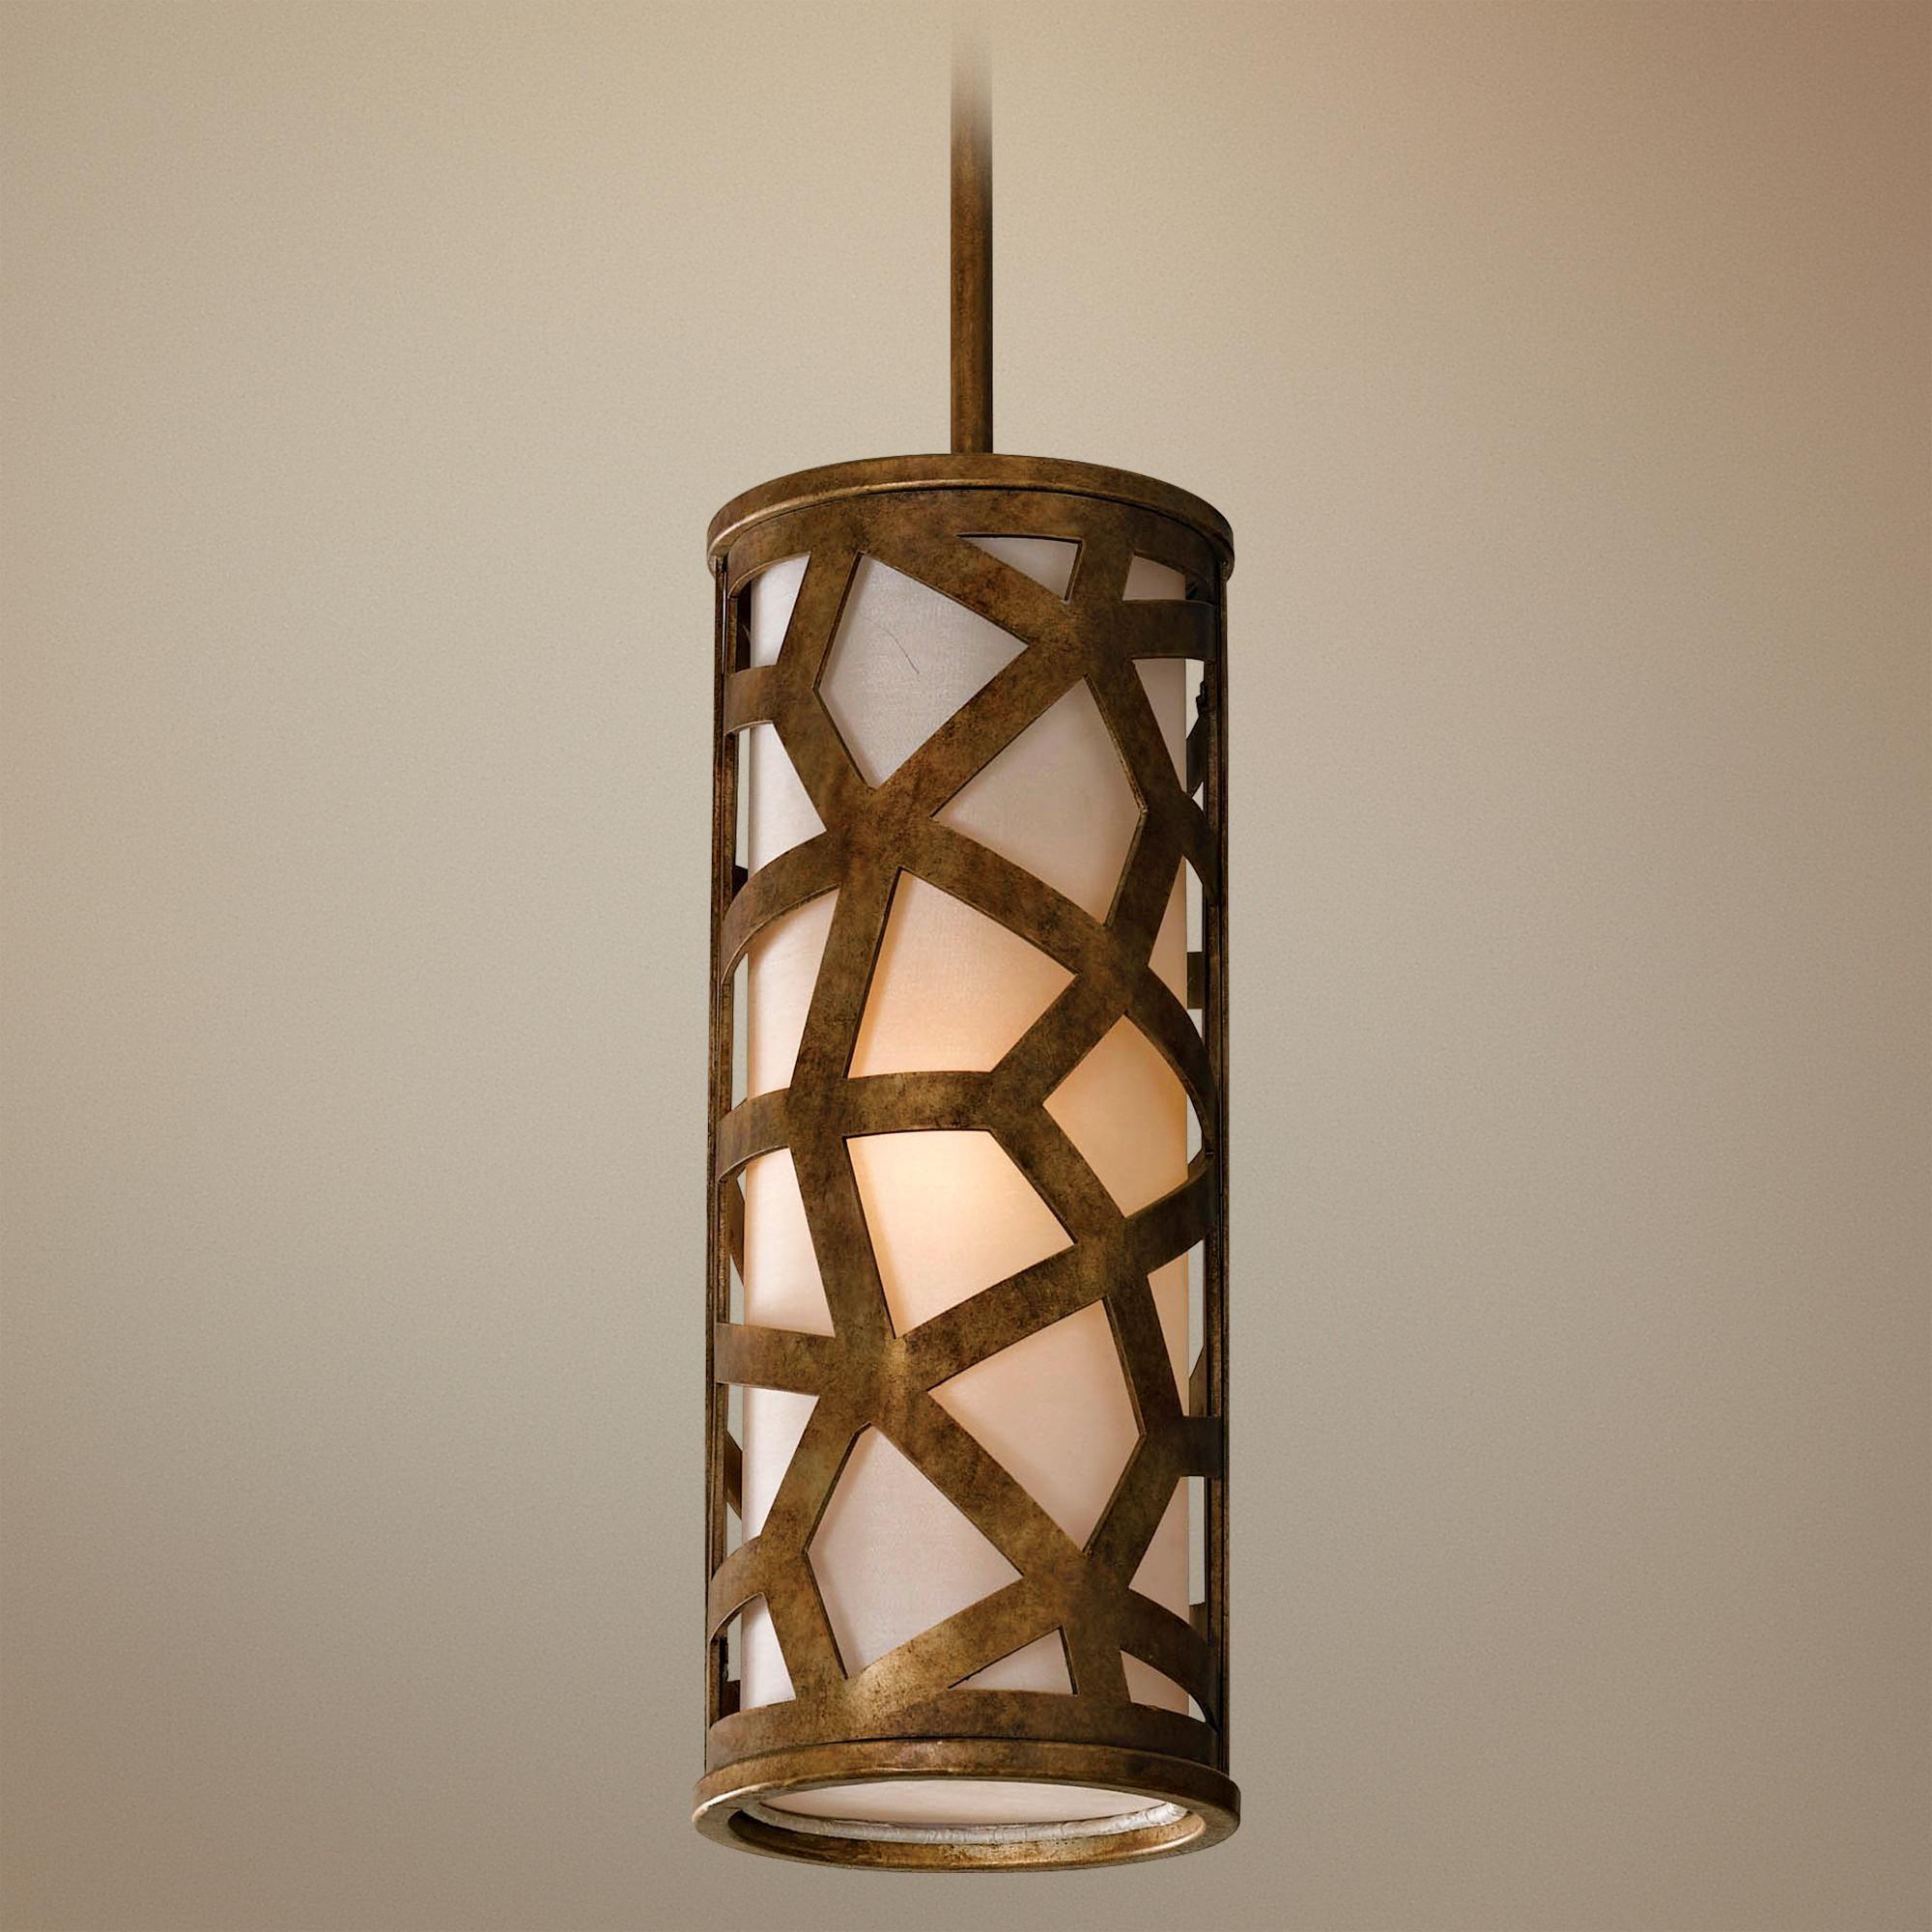 Murray feiss medina collection mini pendant light lampsplus